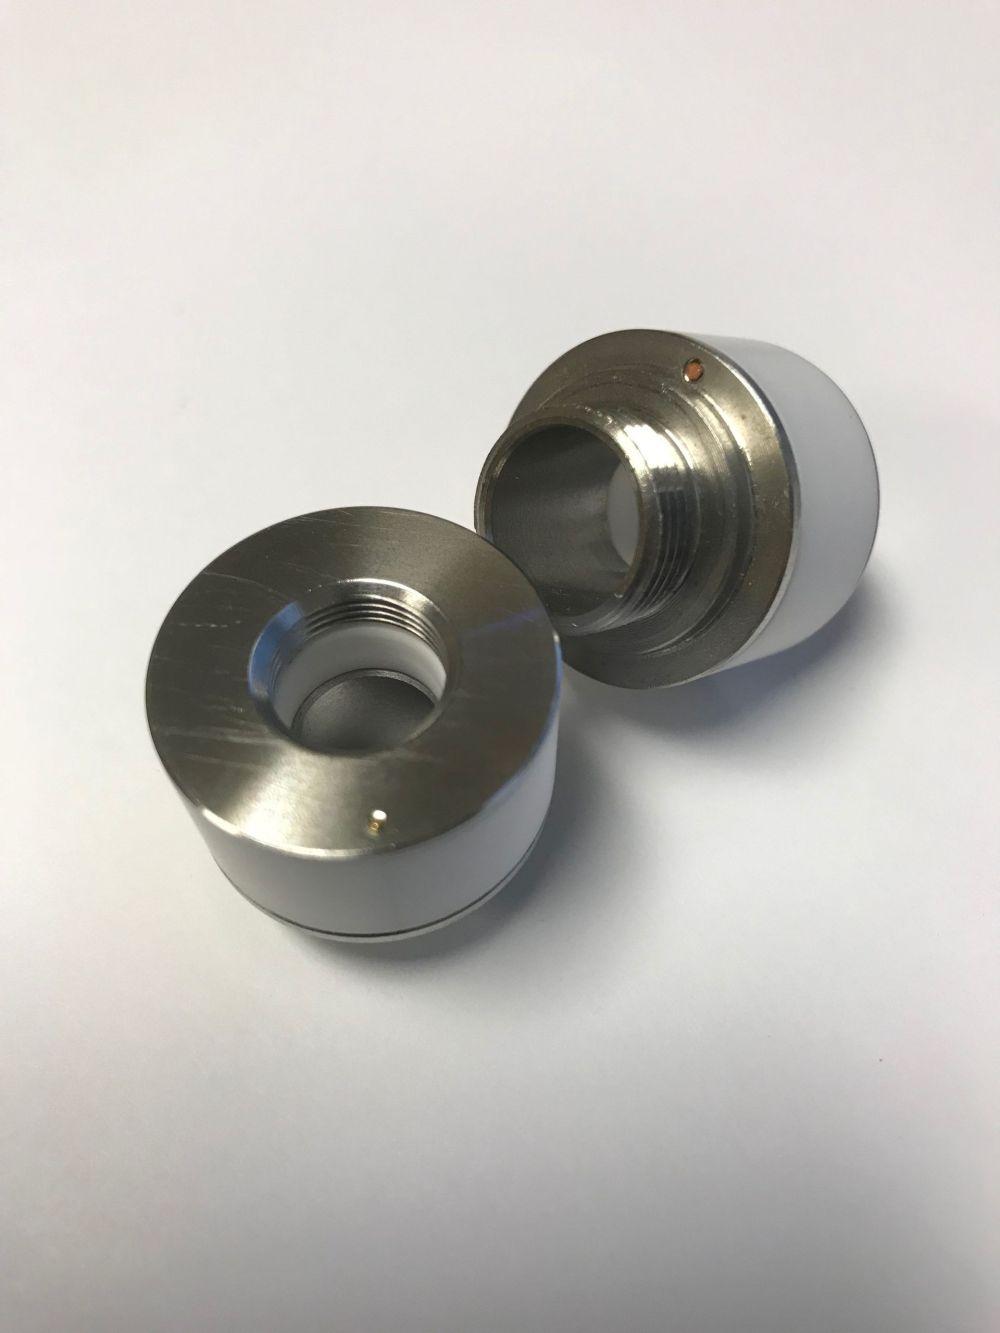 Nukon Ceramic Nozzle Adaptor Holder for Highyag Laser Head (New Style)